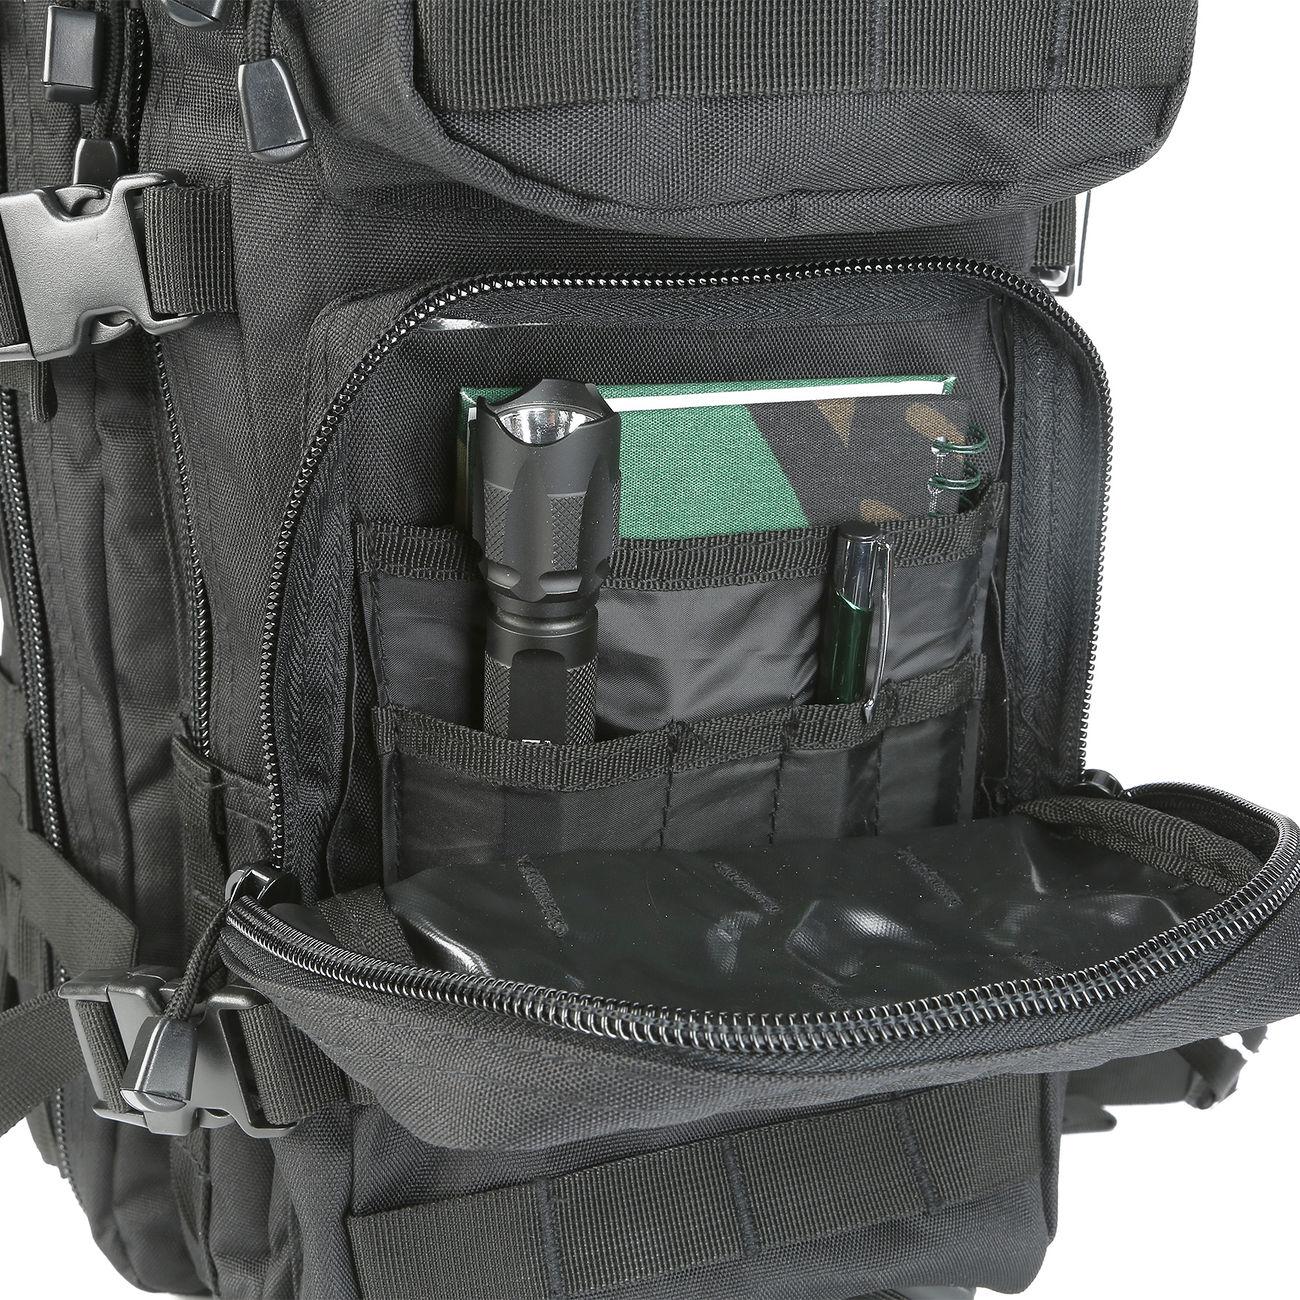 795bd191e58d4 Mil-Tec Rucksack US Assault Pack I 20 Liter schwarz günstig kaufen ...